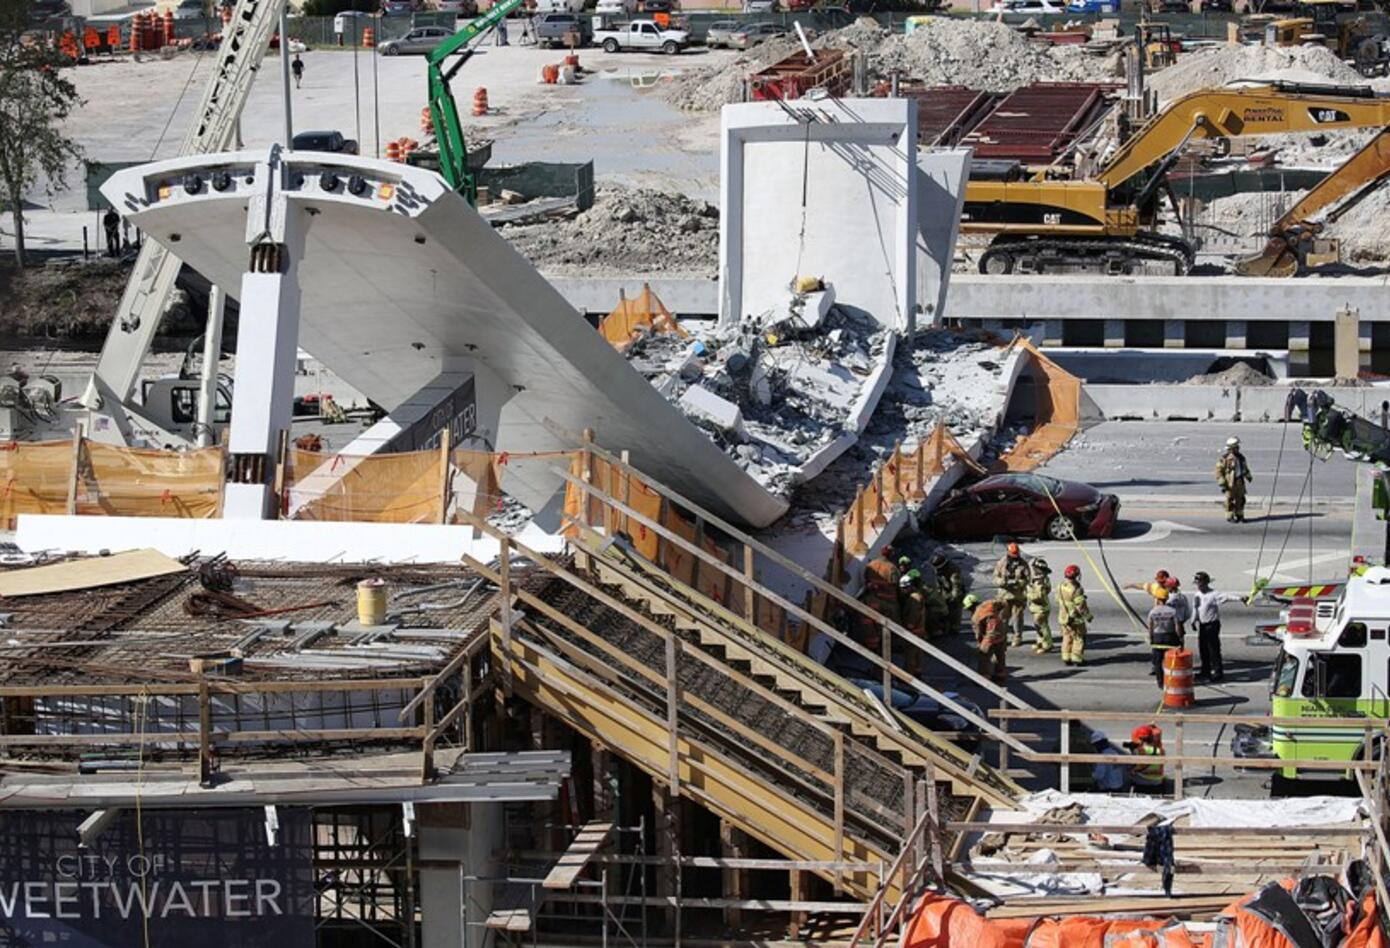 Colapso de puente peatonal en Miami deja al menos 10 heridos